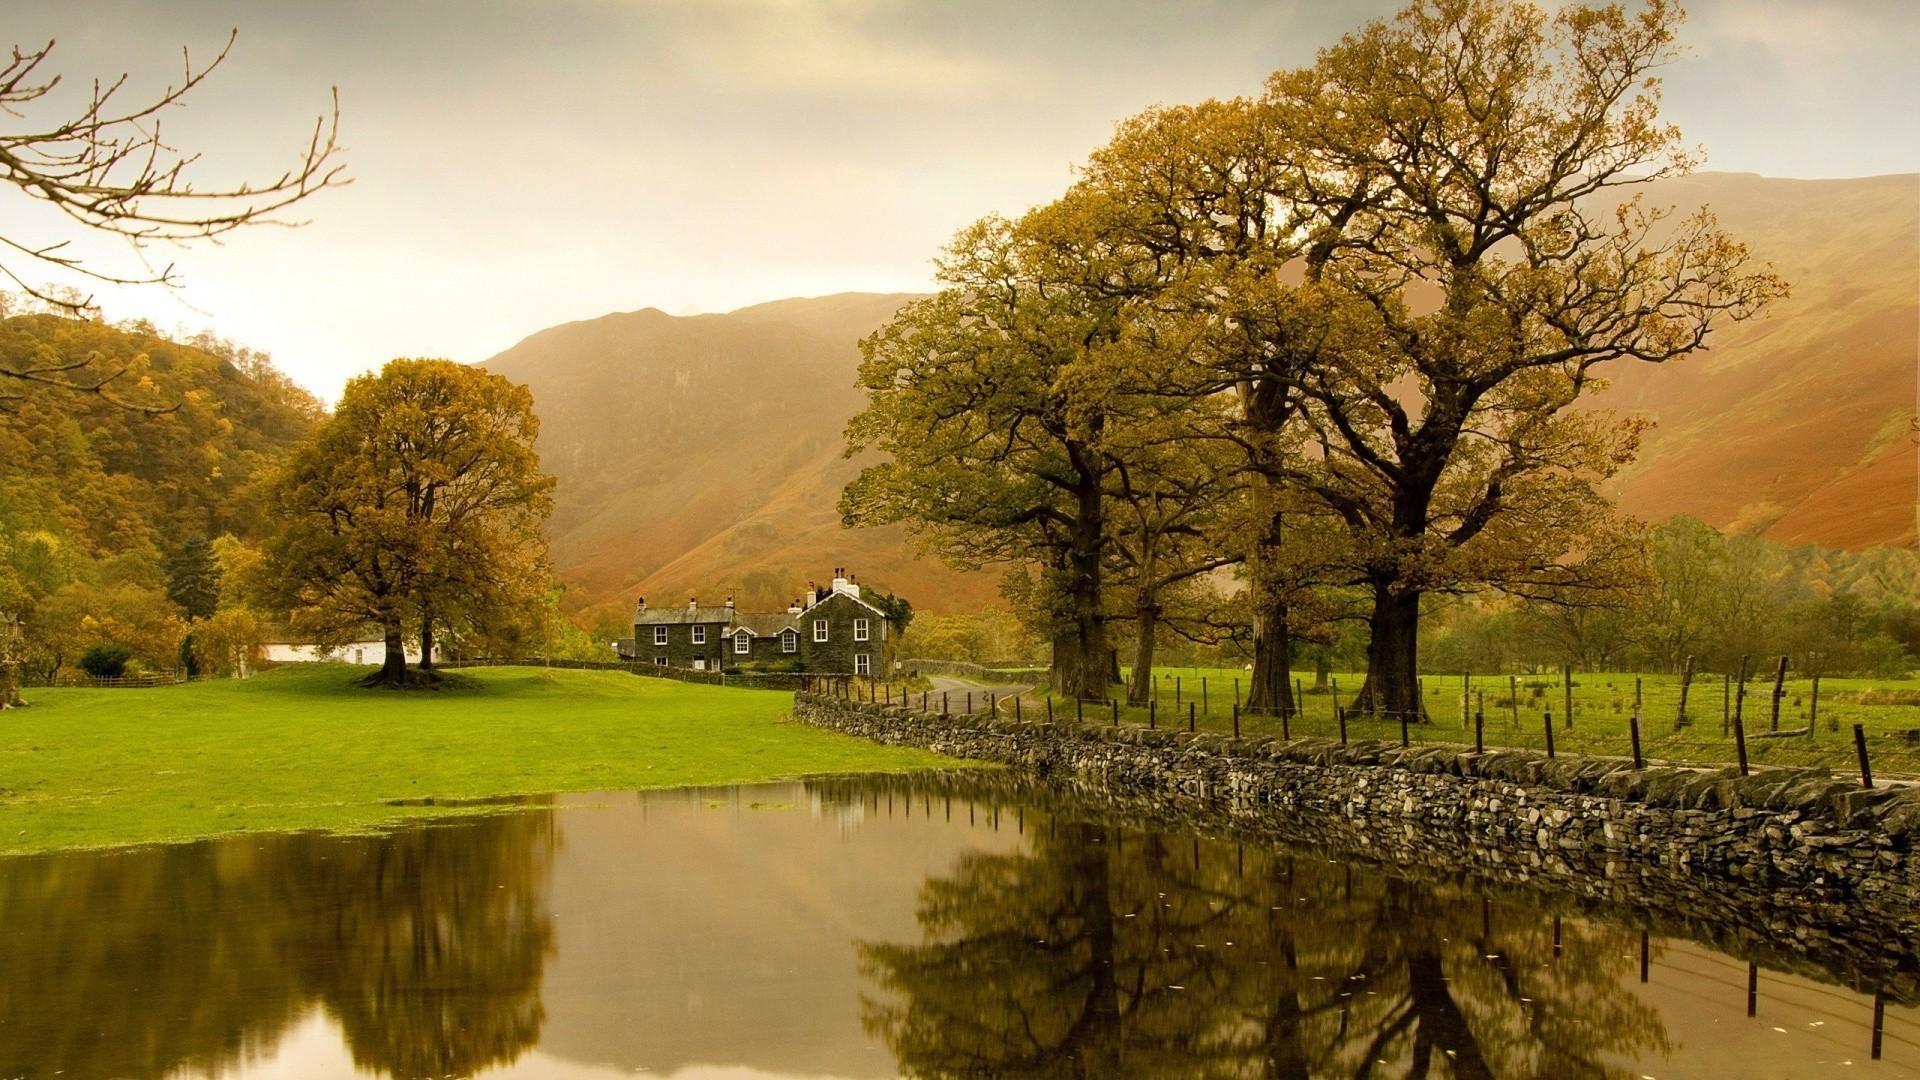 English countryside wallpaper   599523 1920x1080